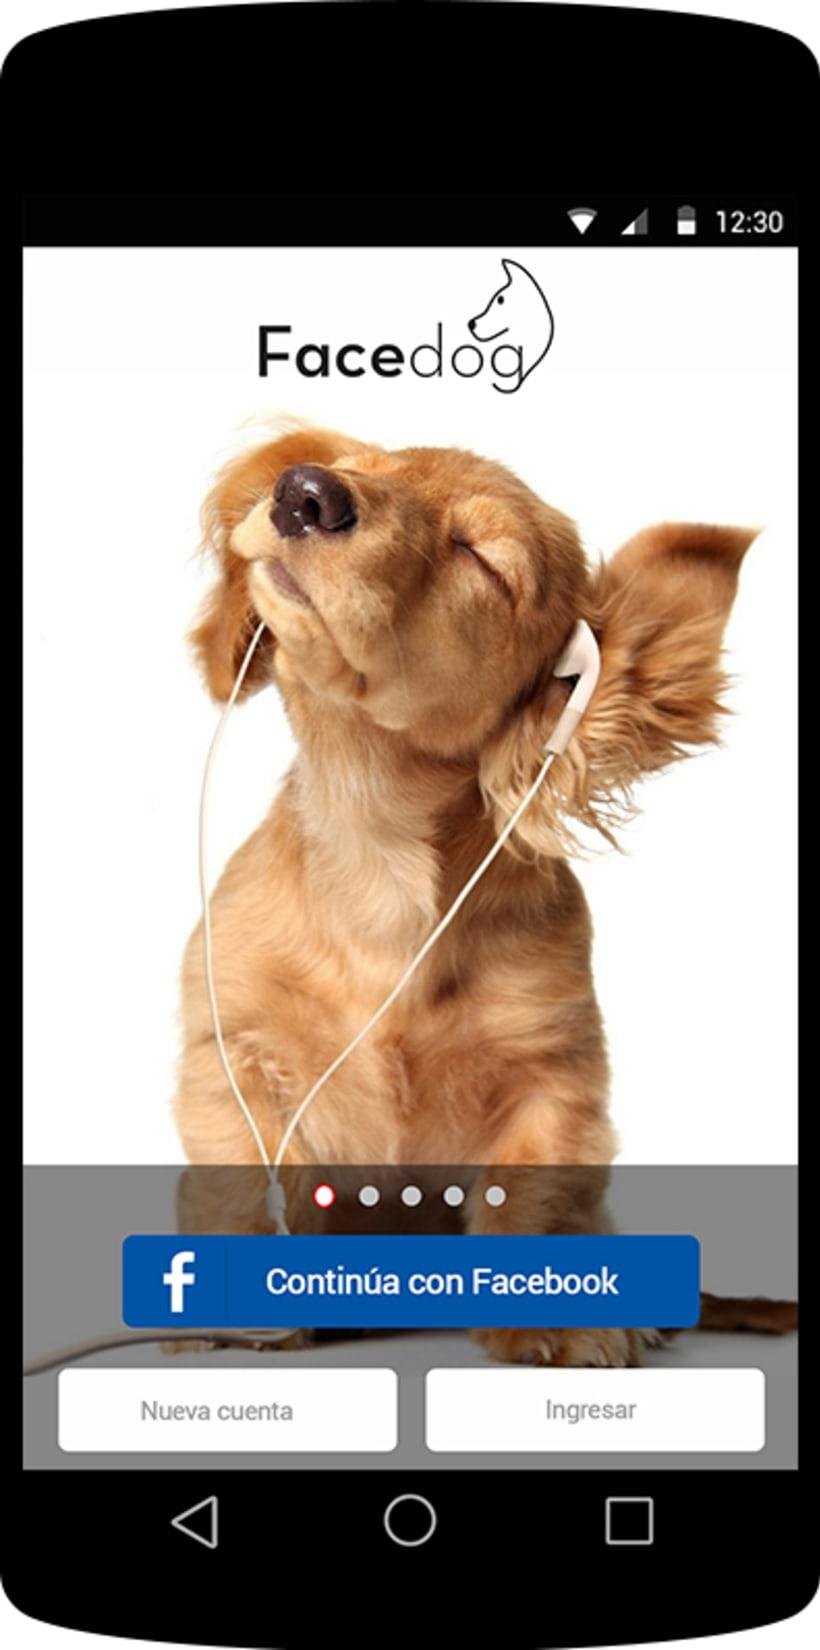 Diseño app Facedog para Android 2